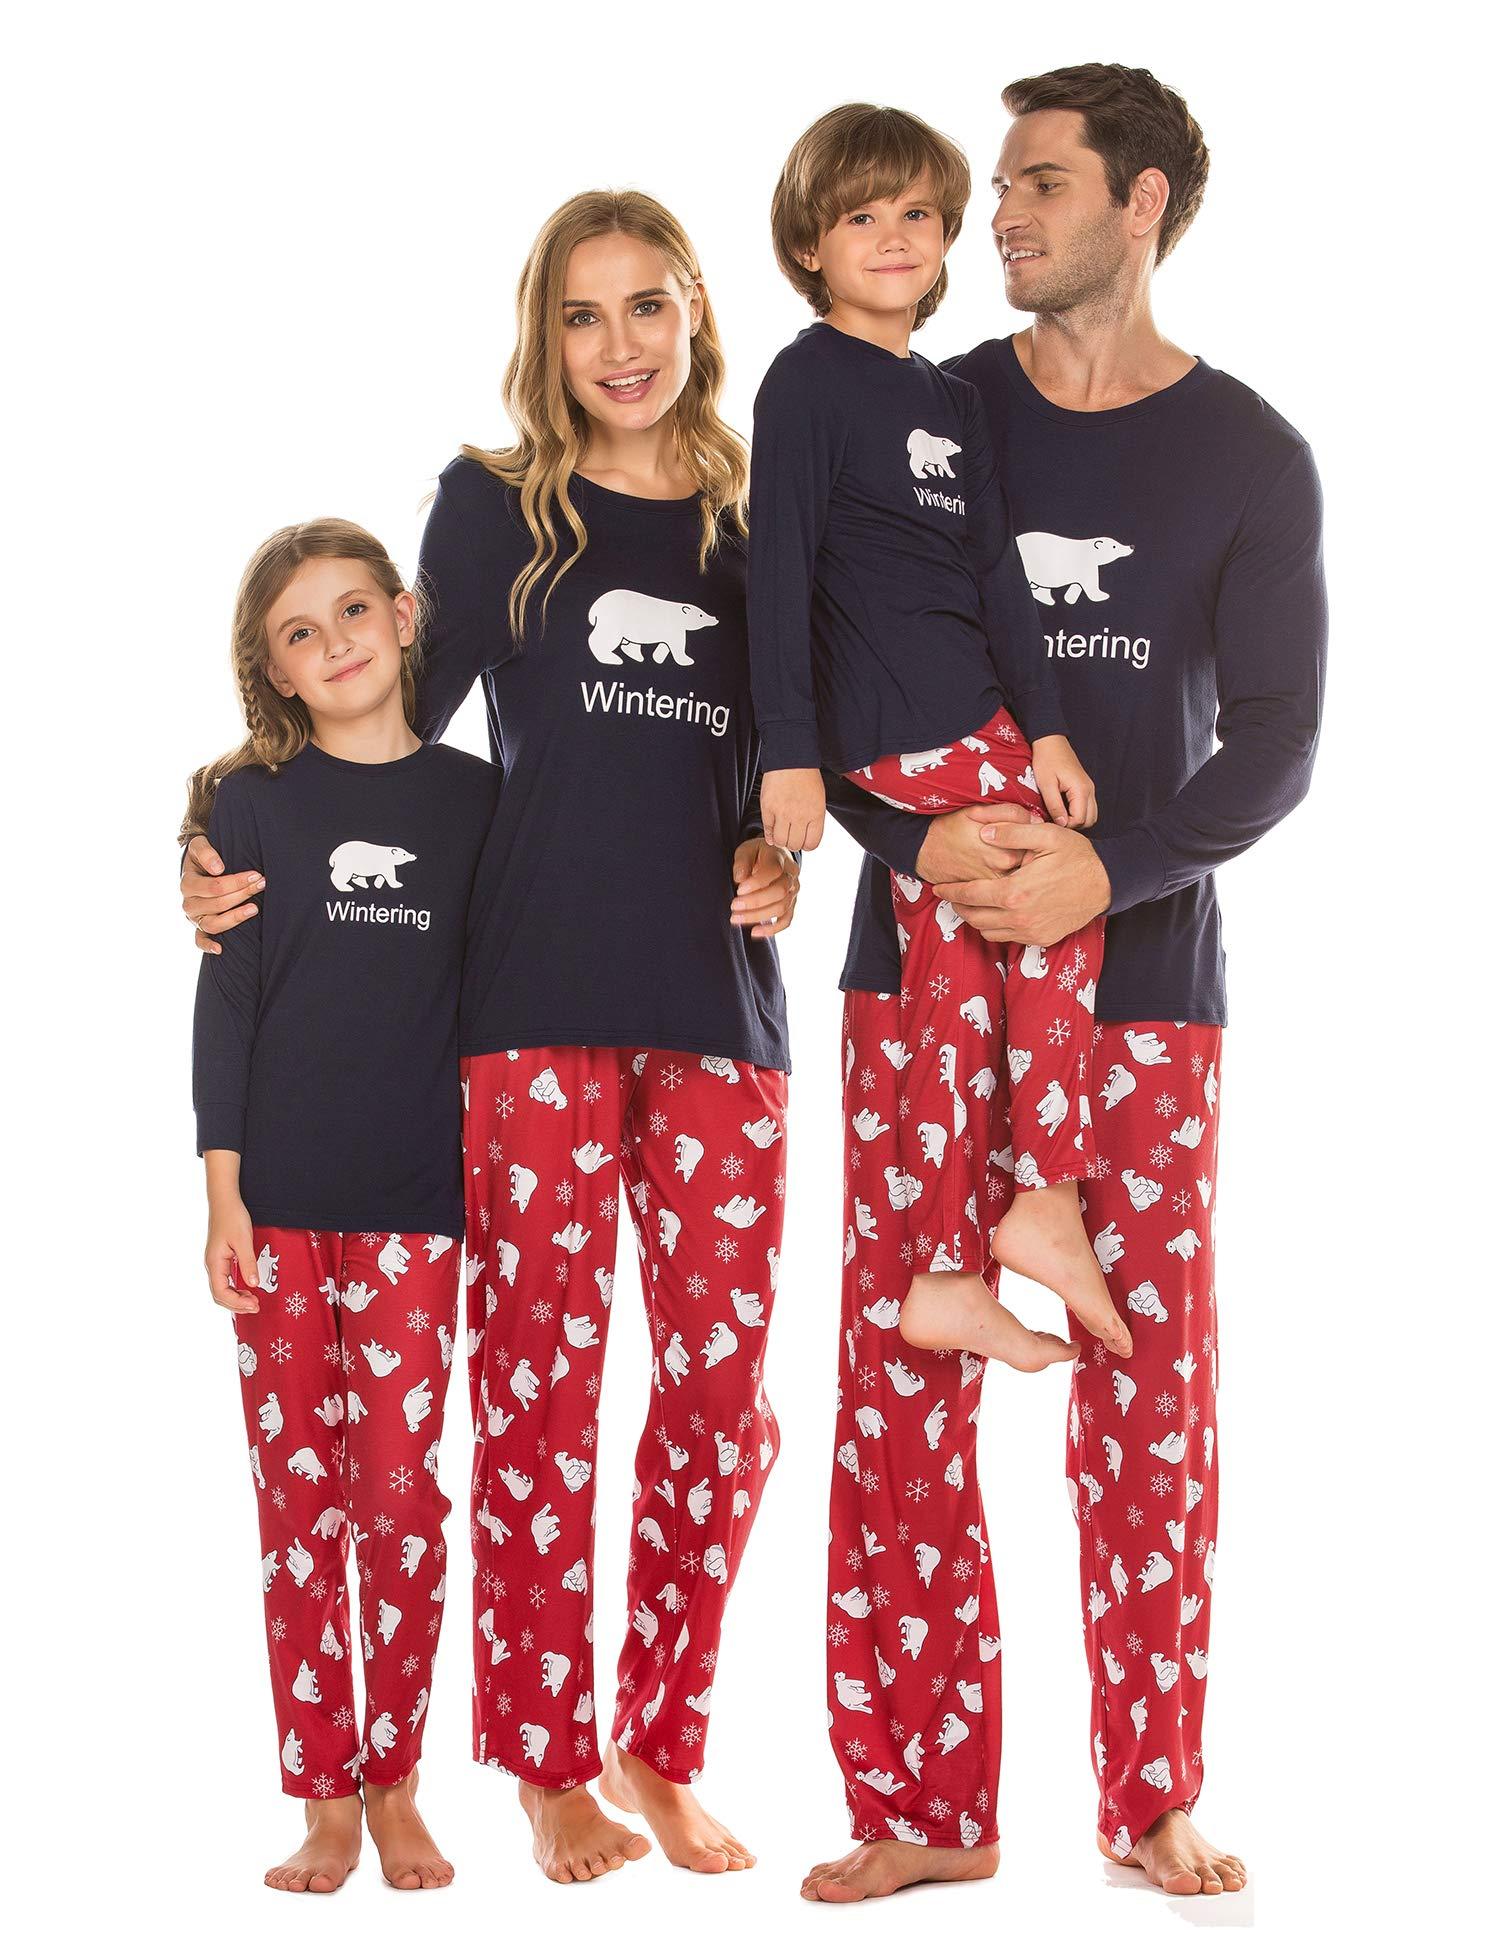 Ekouaer Pajamas Set Matching Family Christmas Pjs Cute Holiday Sleepwear Long Sleeve and Full Length Printed Pants S-XXL